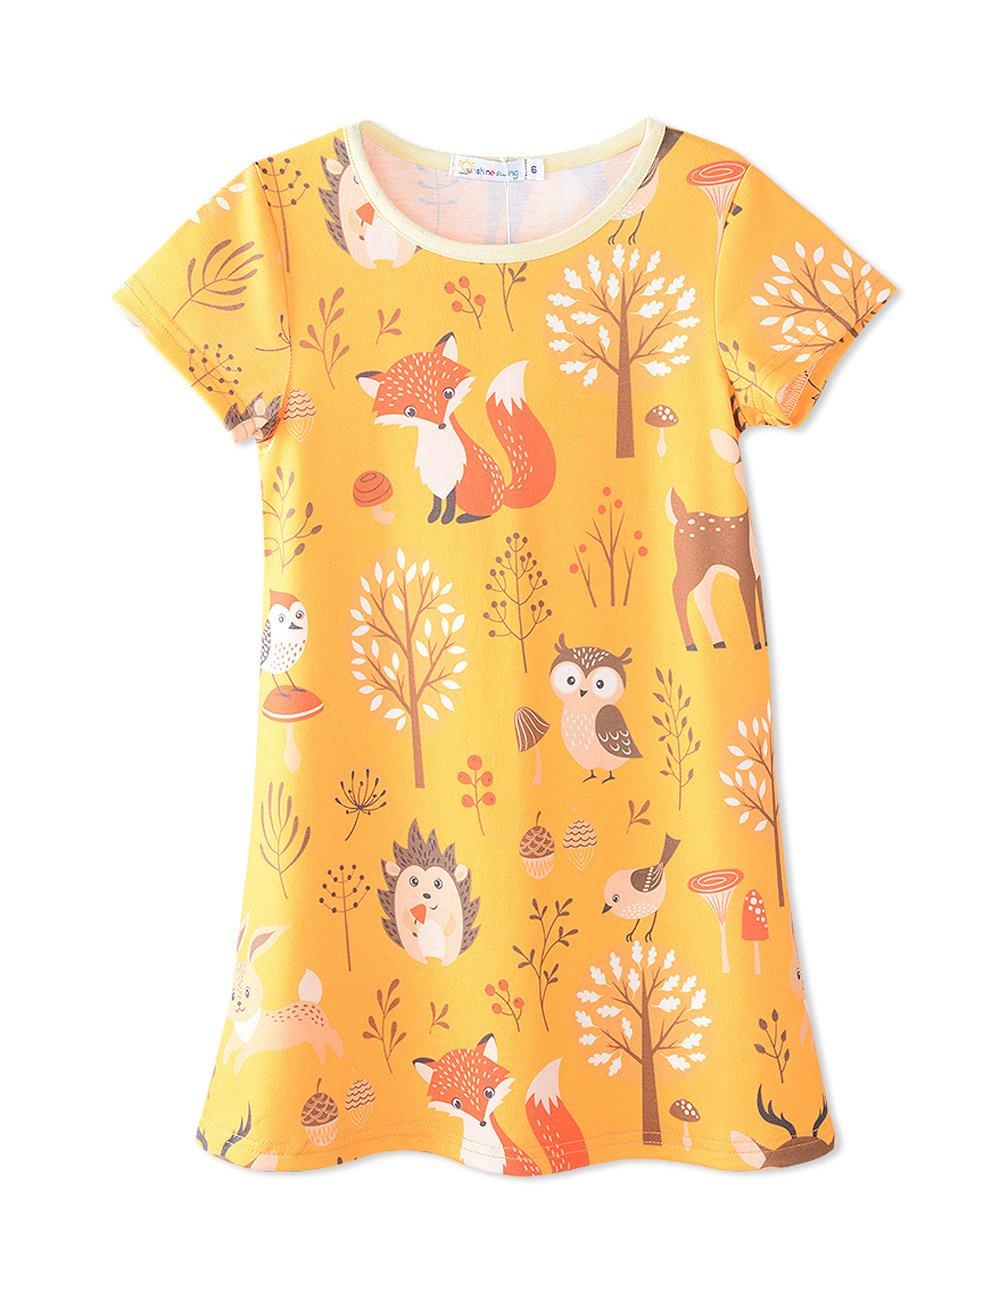 Sunshine Swing Girl's Kids Summer Round Neck Short Sleeve Fox Printed Cartoon Casual Tunic T-Shirt Dress 3T